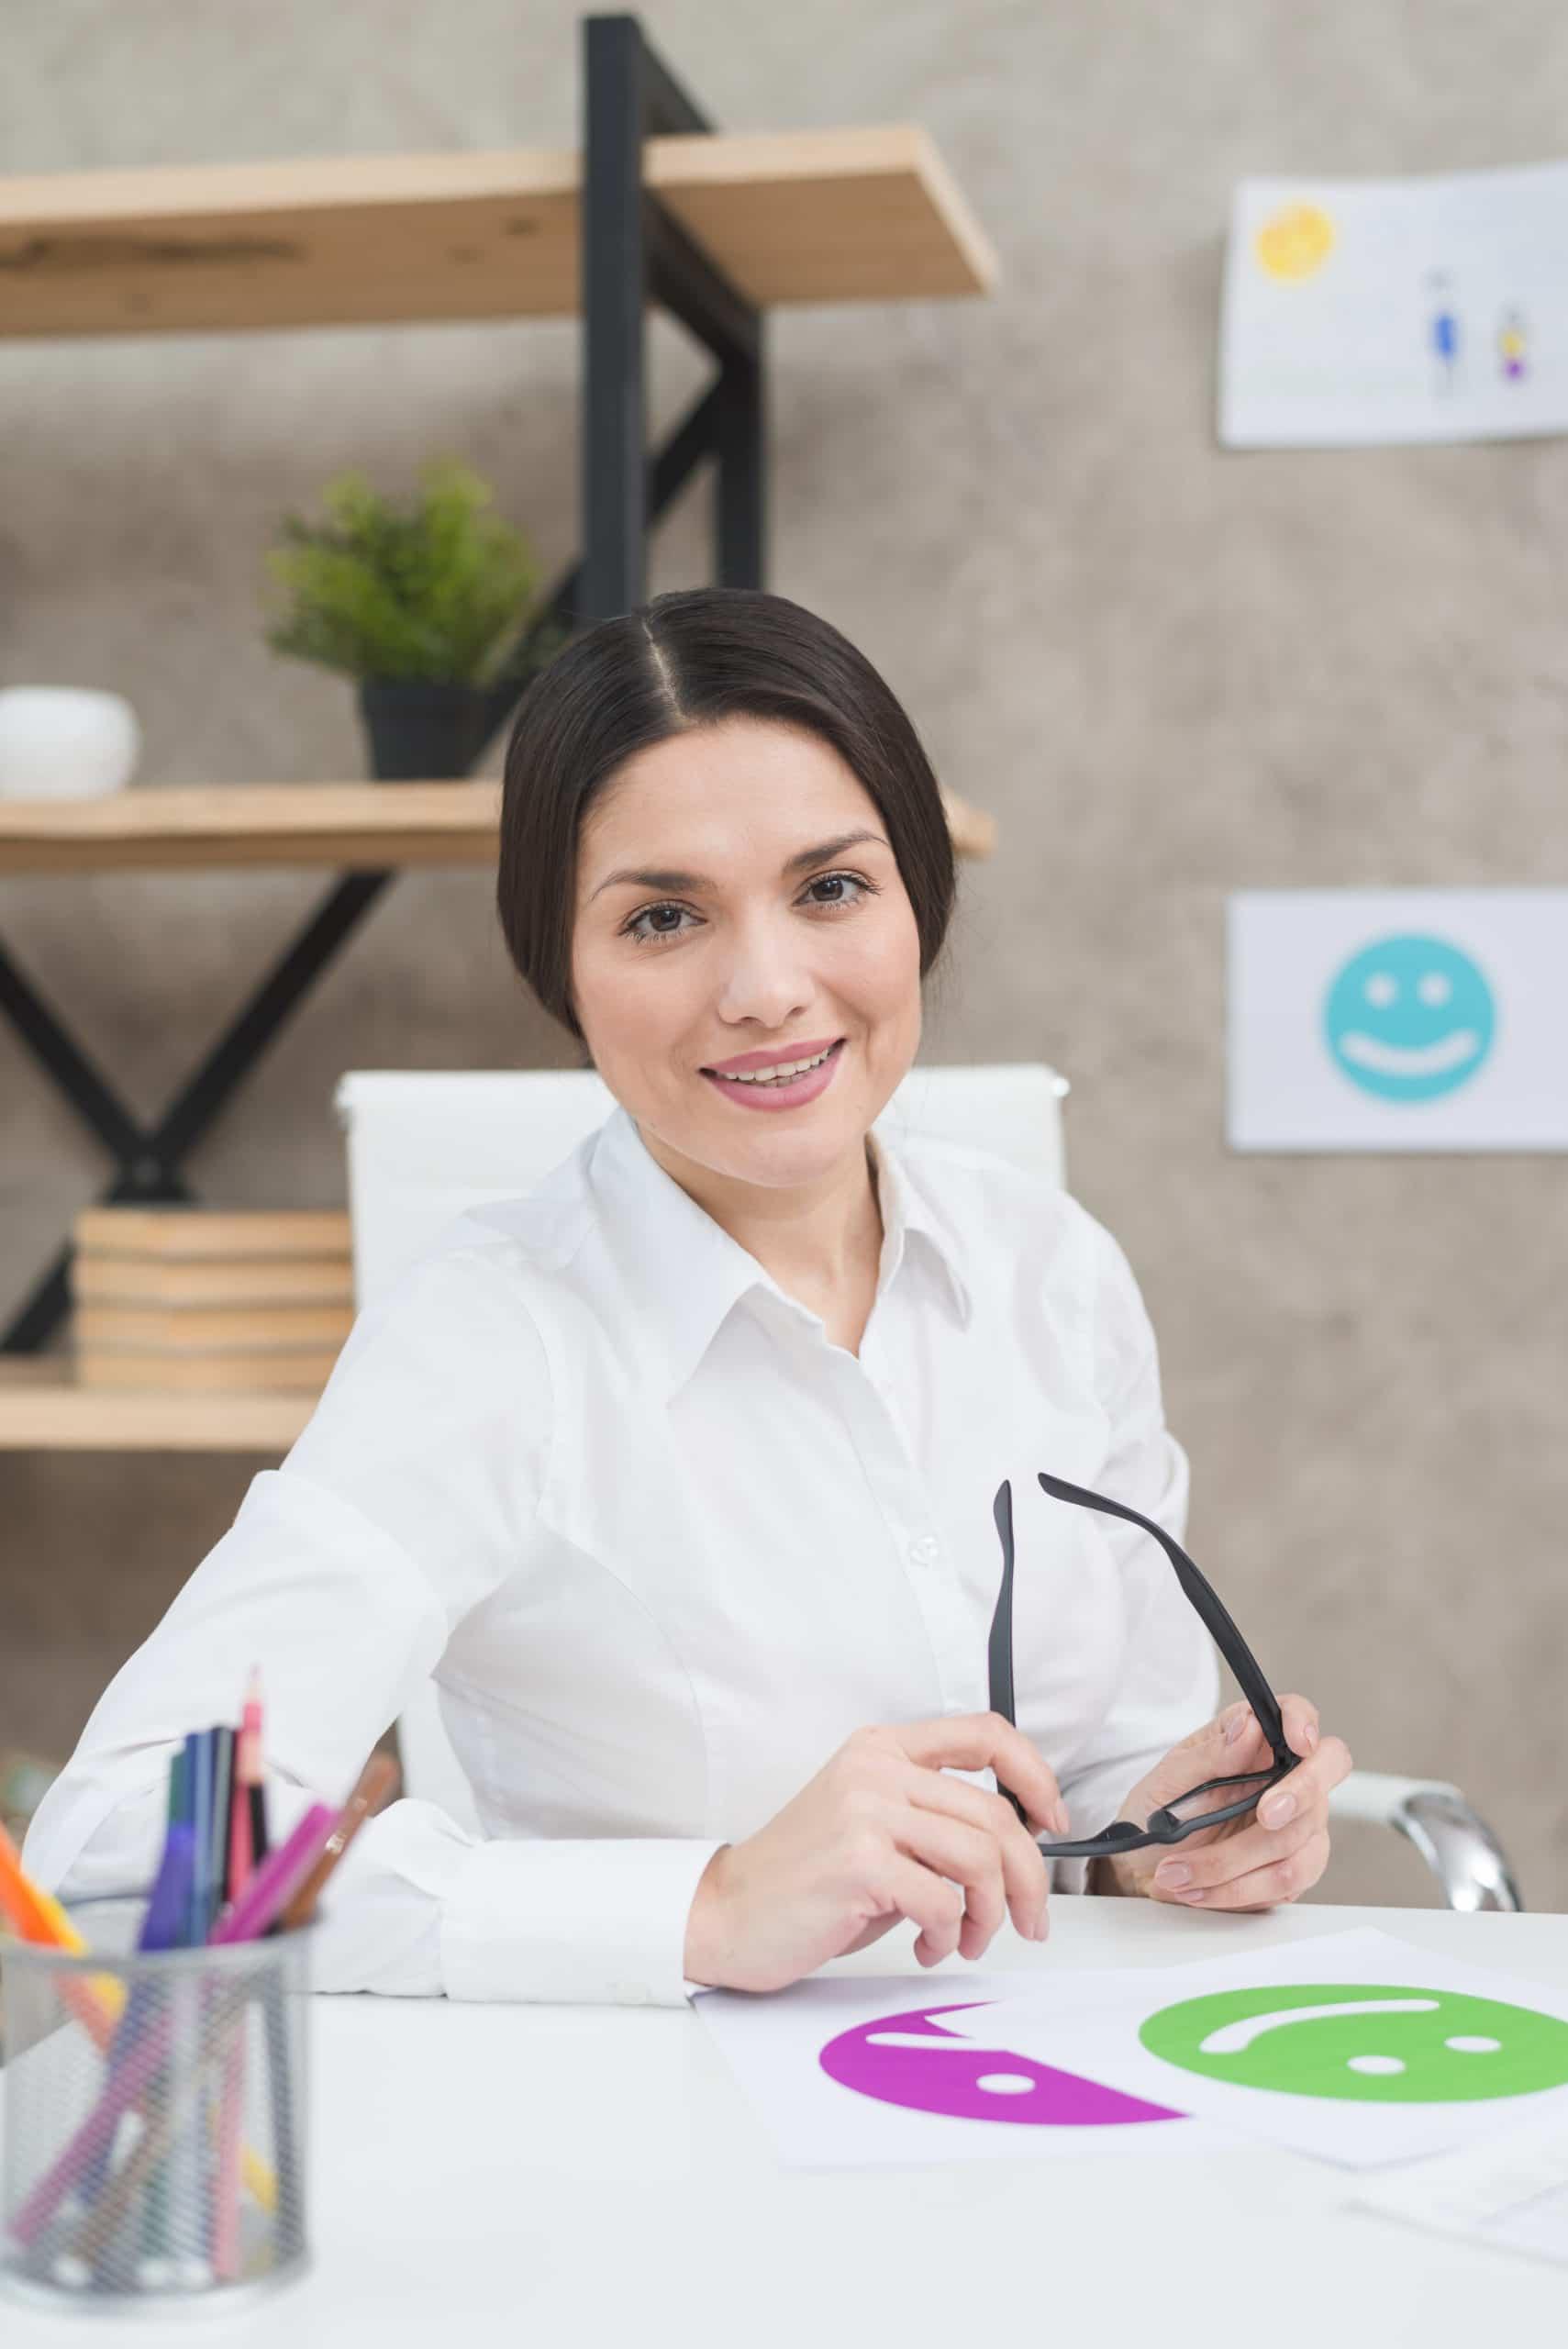 Recrutement Chirurgien Dentiste conseil